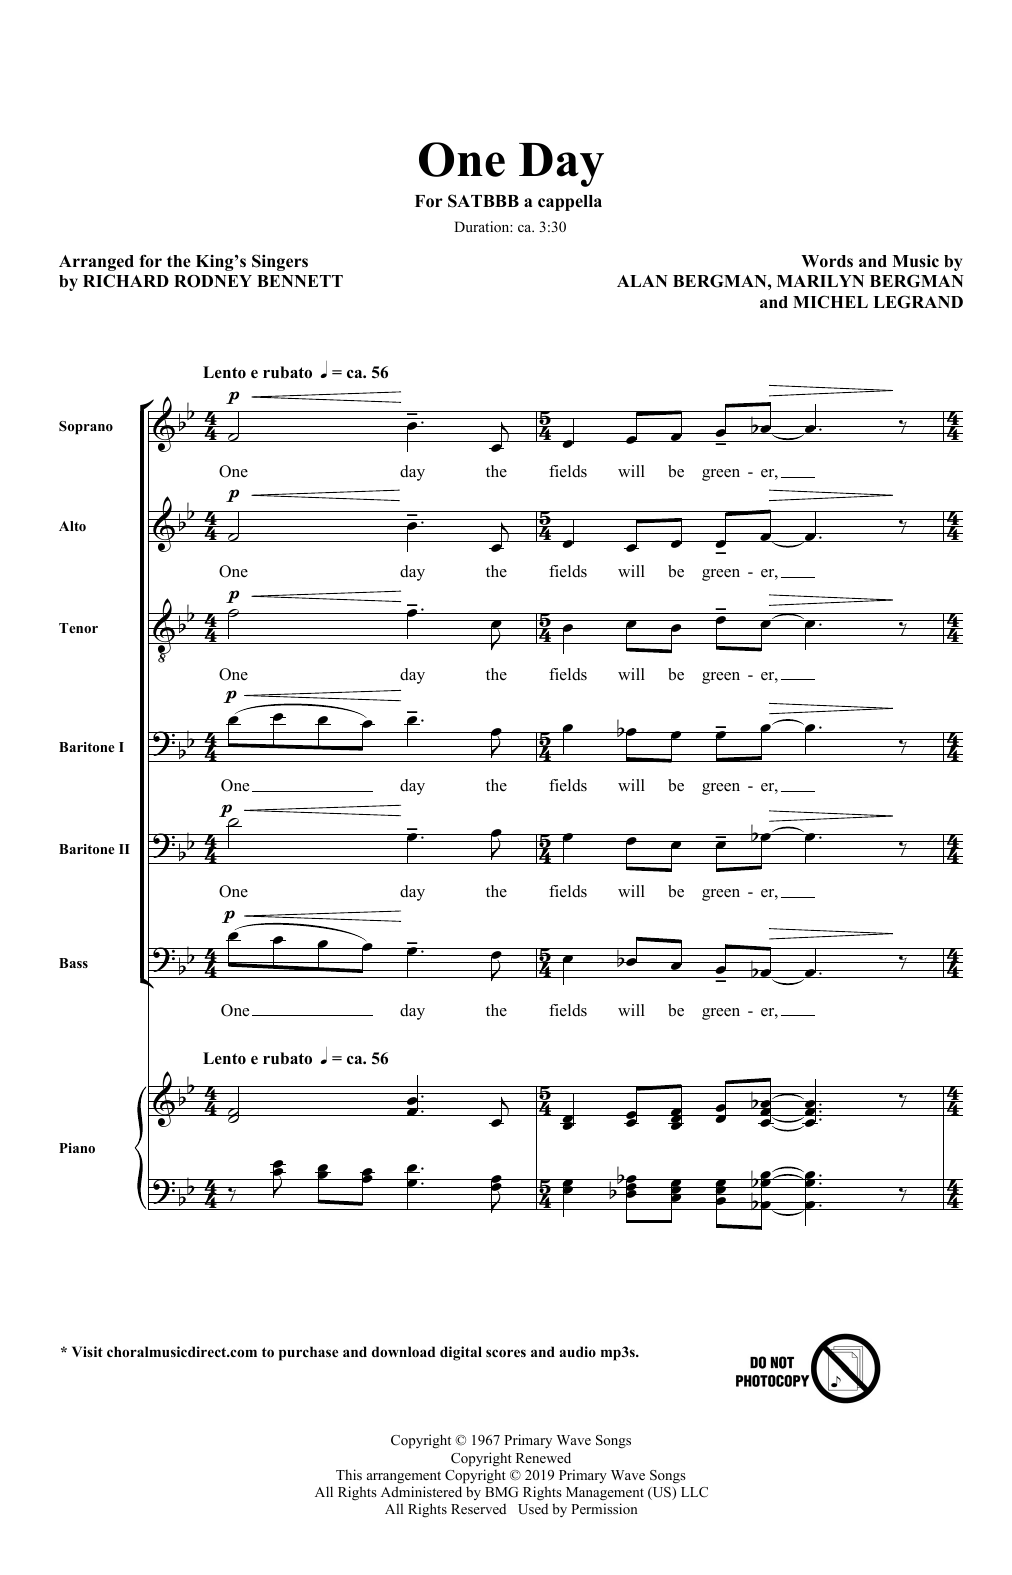 One Day (arr. Richard Rodney Bennett) (SATB Choir)